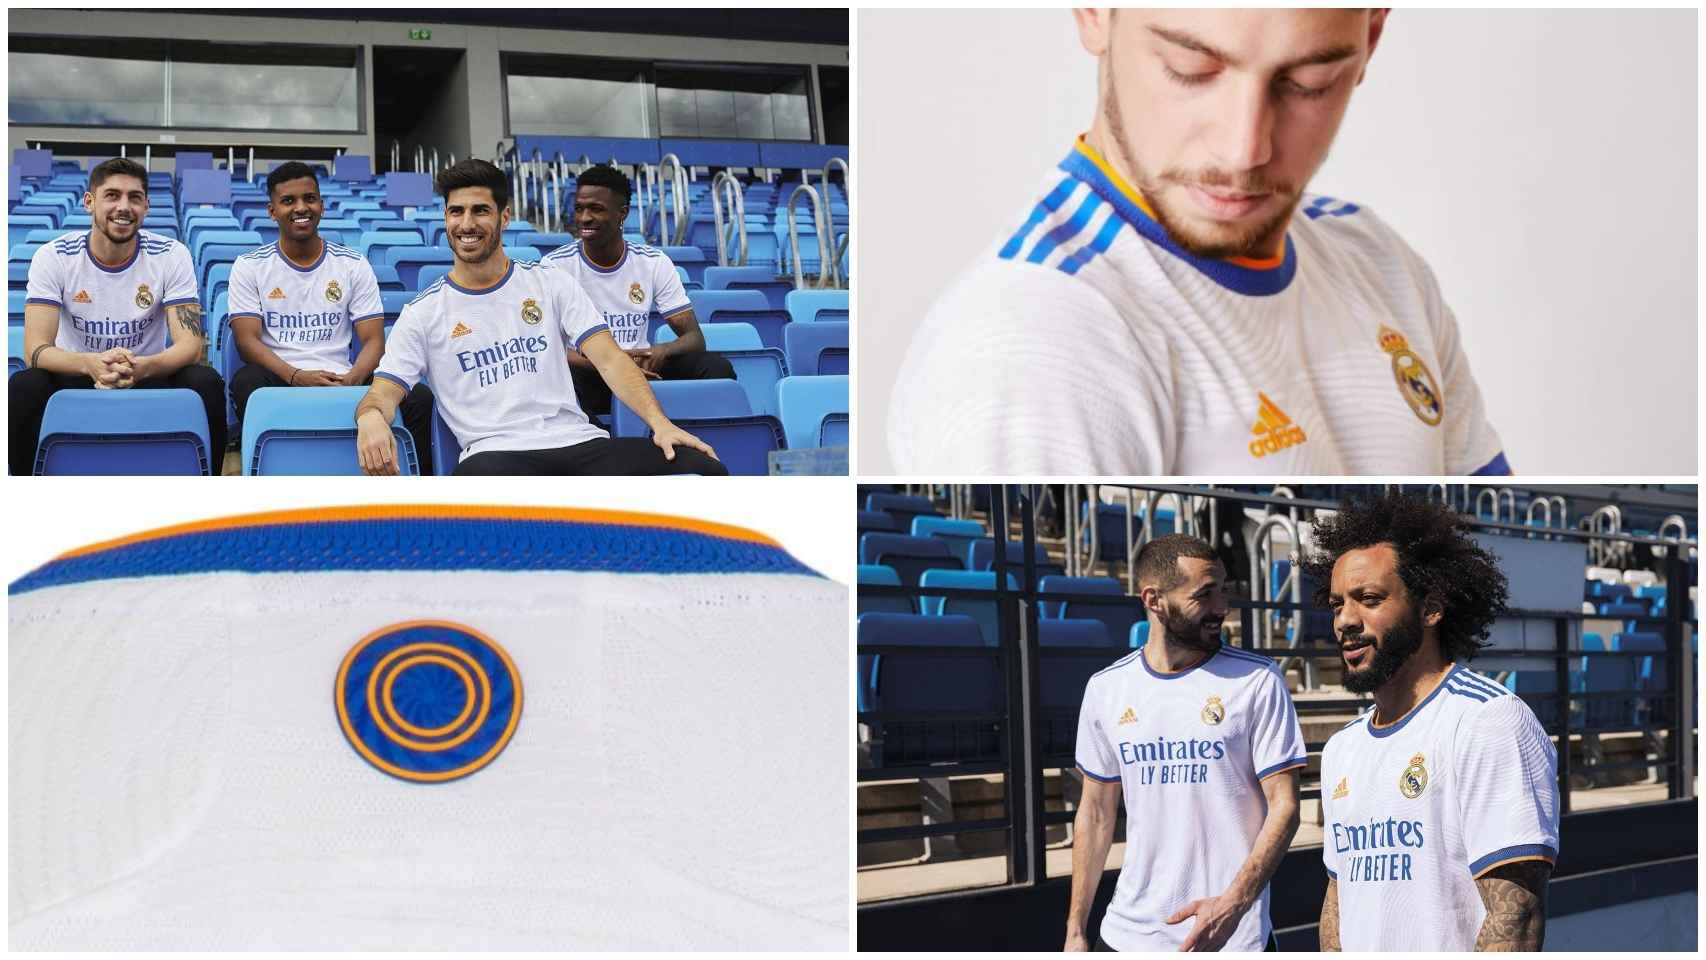 La nueva camiseta del Real Madrid 2021/2022, al detalle